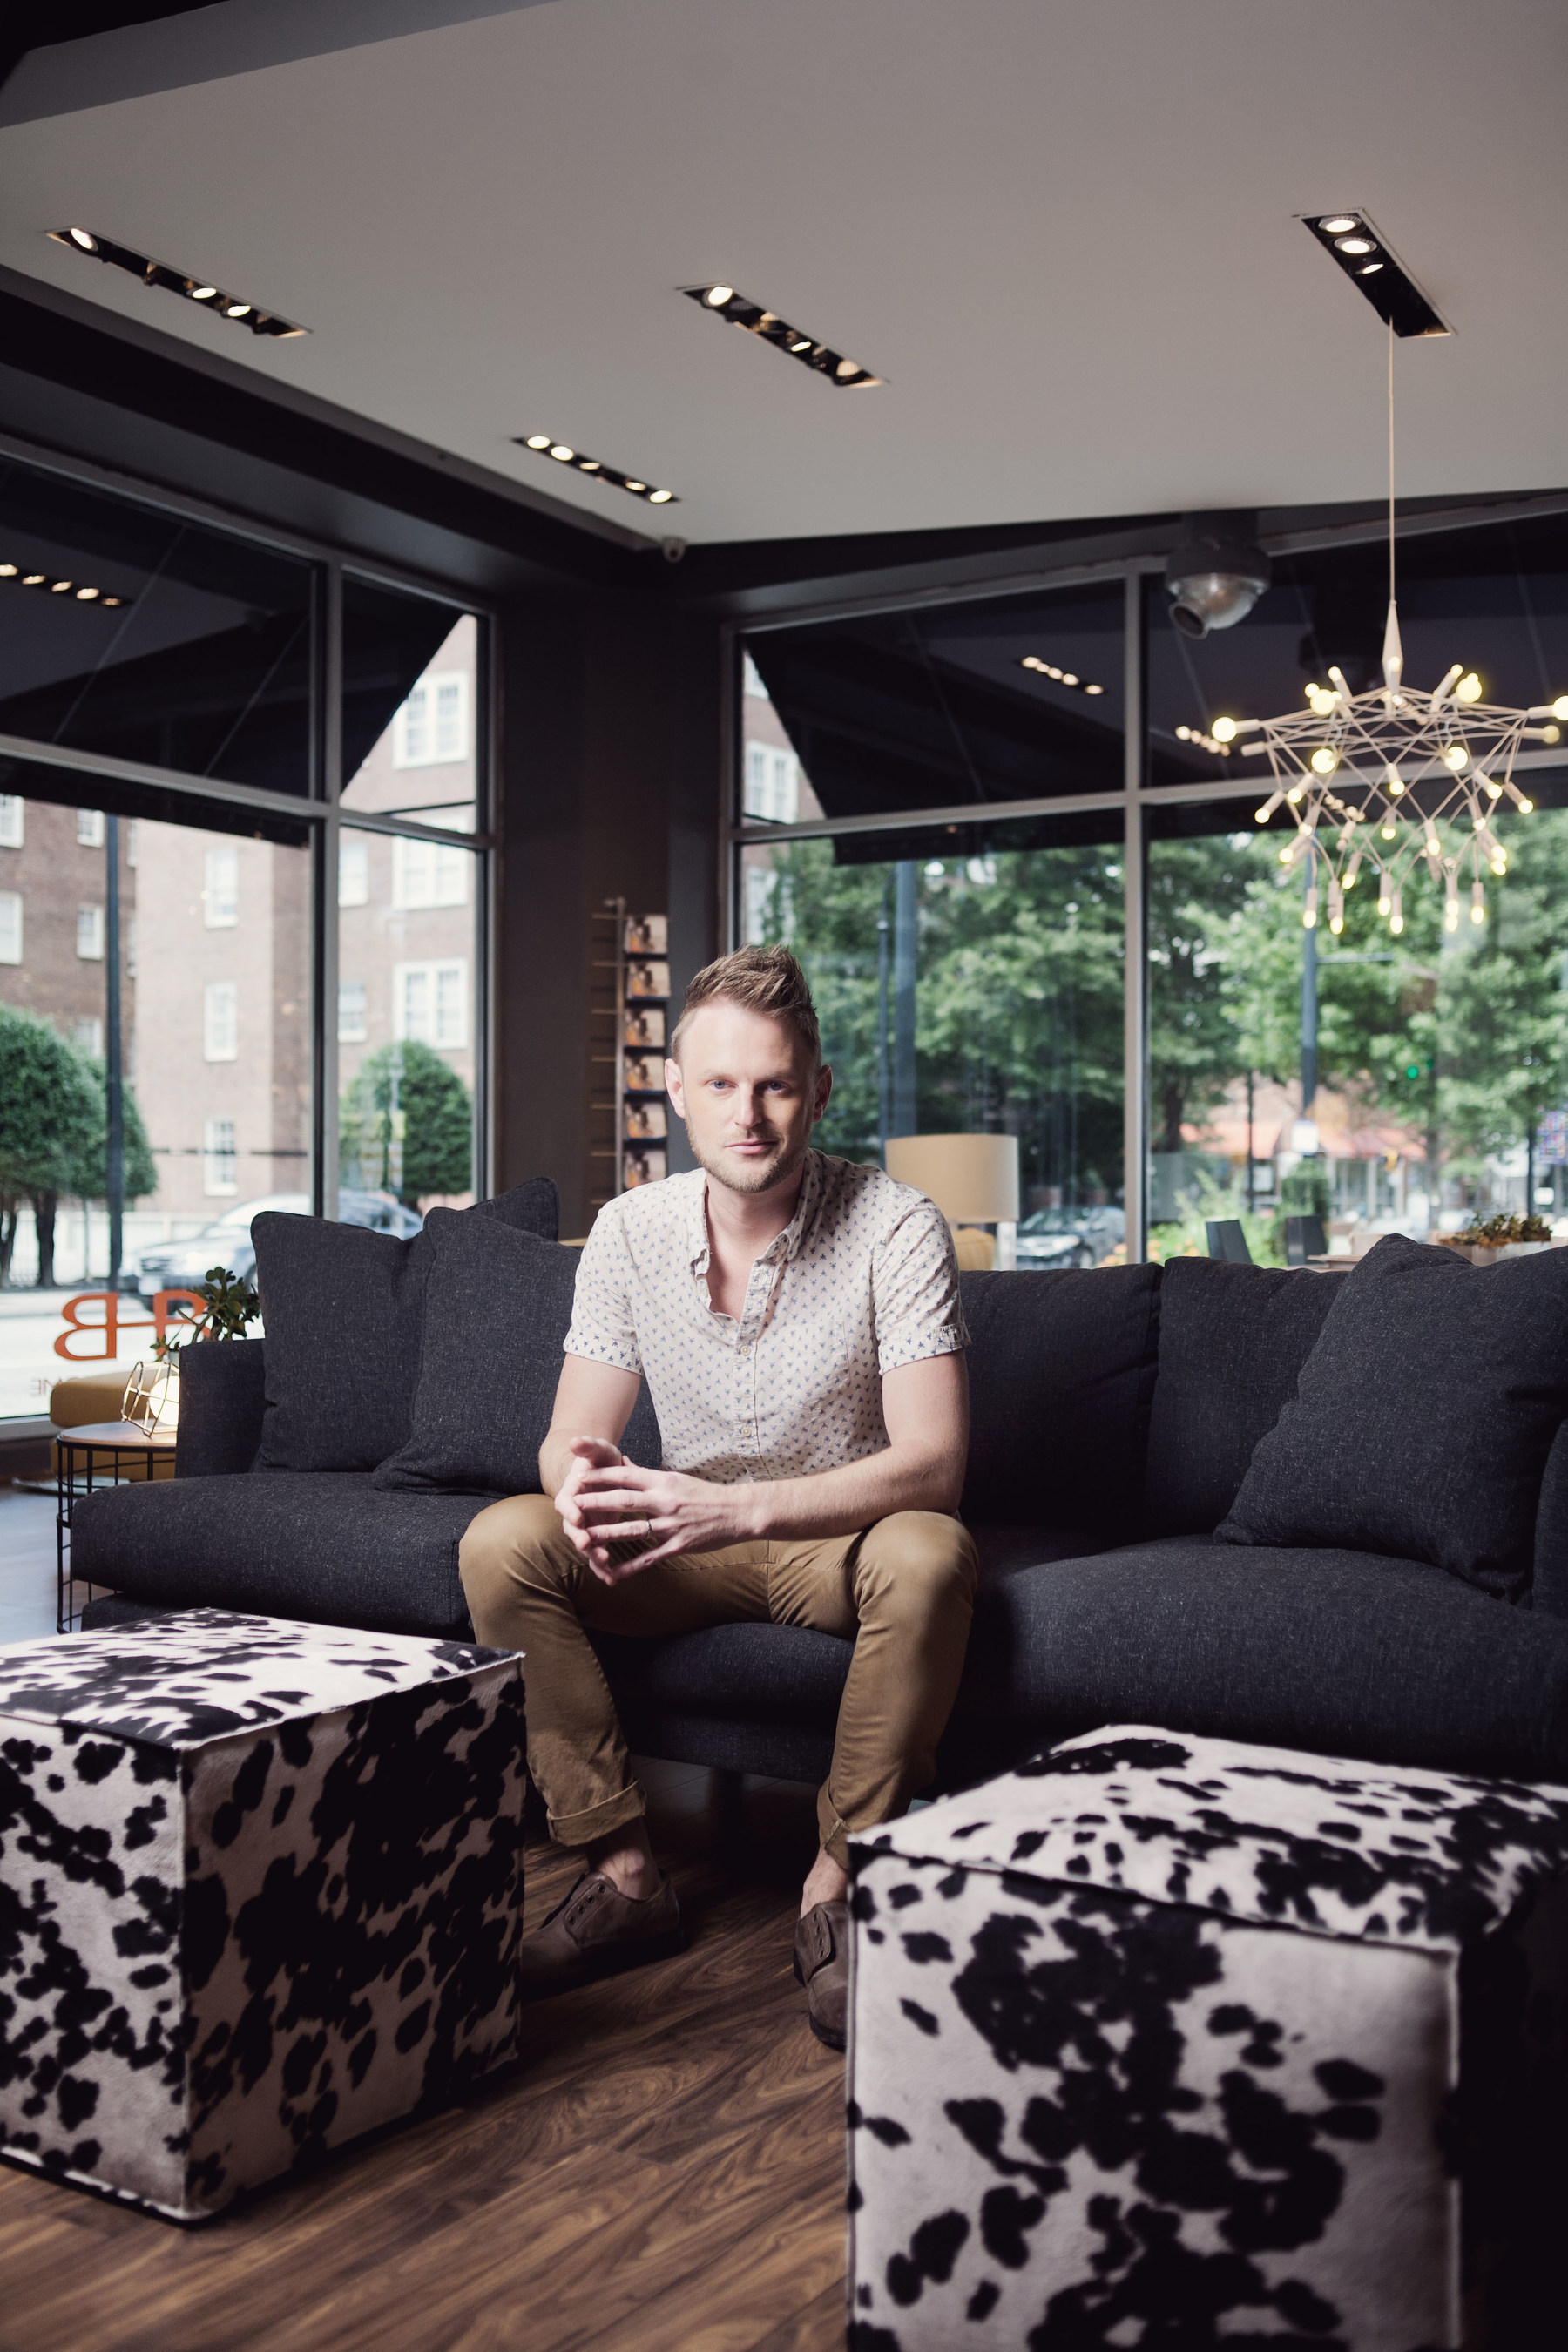 Pardee Homes Chooses Millennial Designer Bobby Berk As Creative Director For Innovative Concept